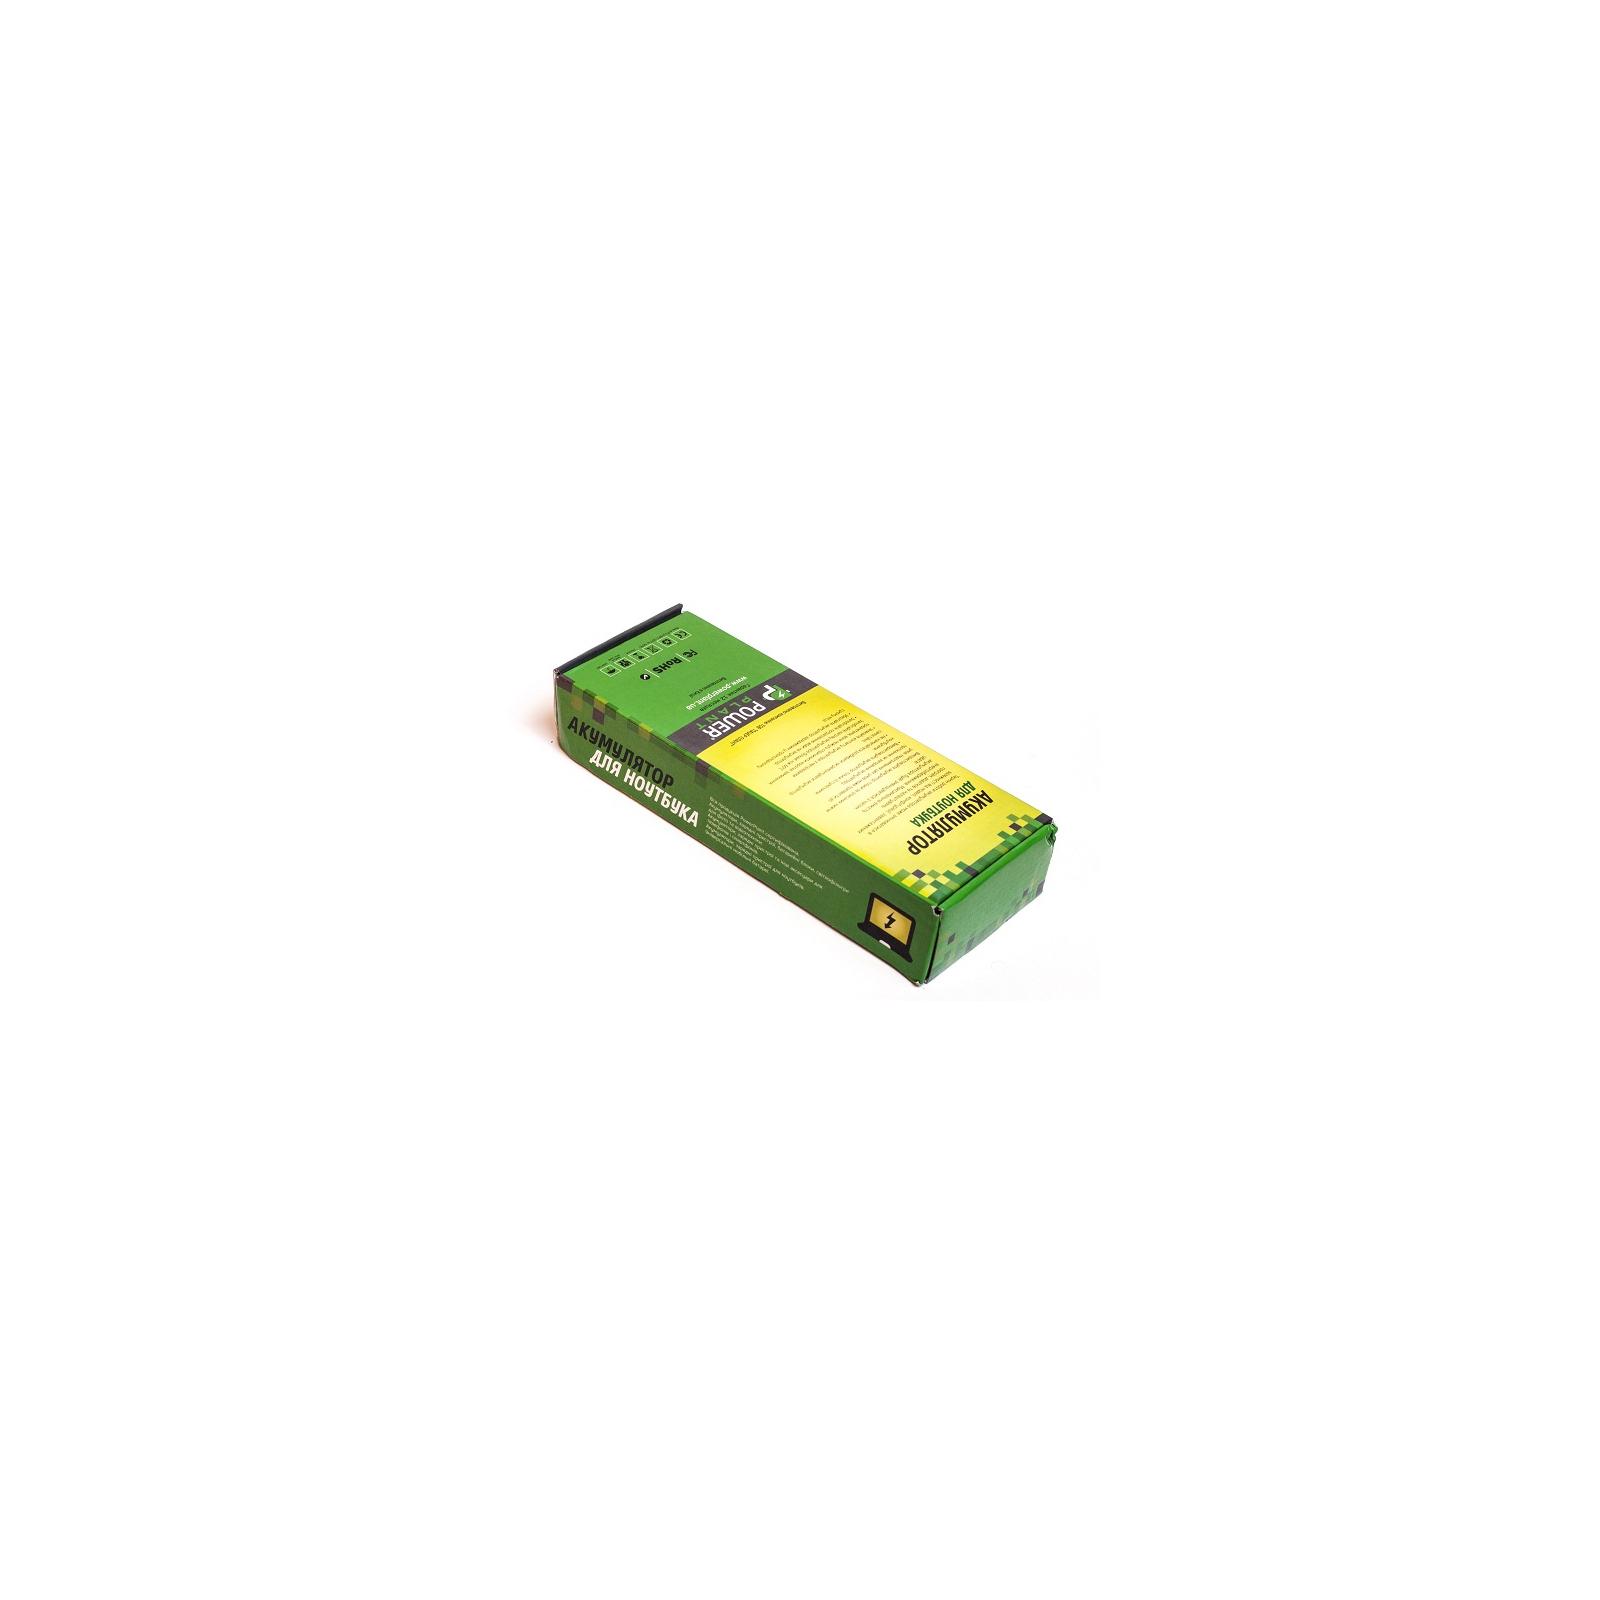 Аккумулятор для ноутбука ACER SMARTSTEP 200n (BTP-44A3 AC-44A3-8) 14.8V 4400mAh PowerPlant (NB00000166) изображение 2